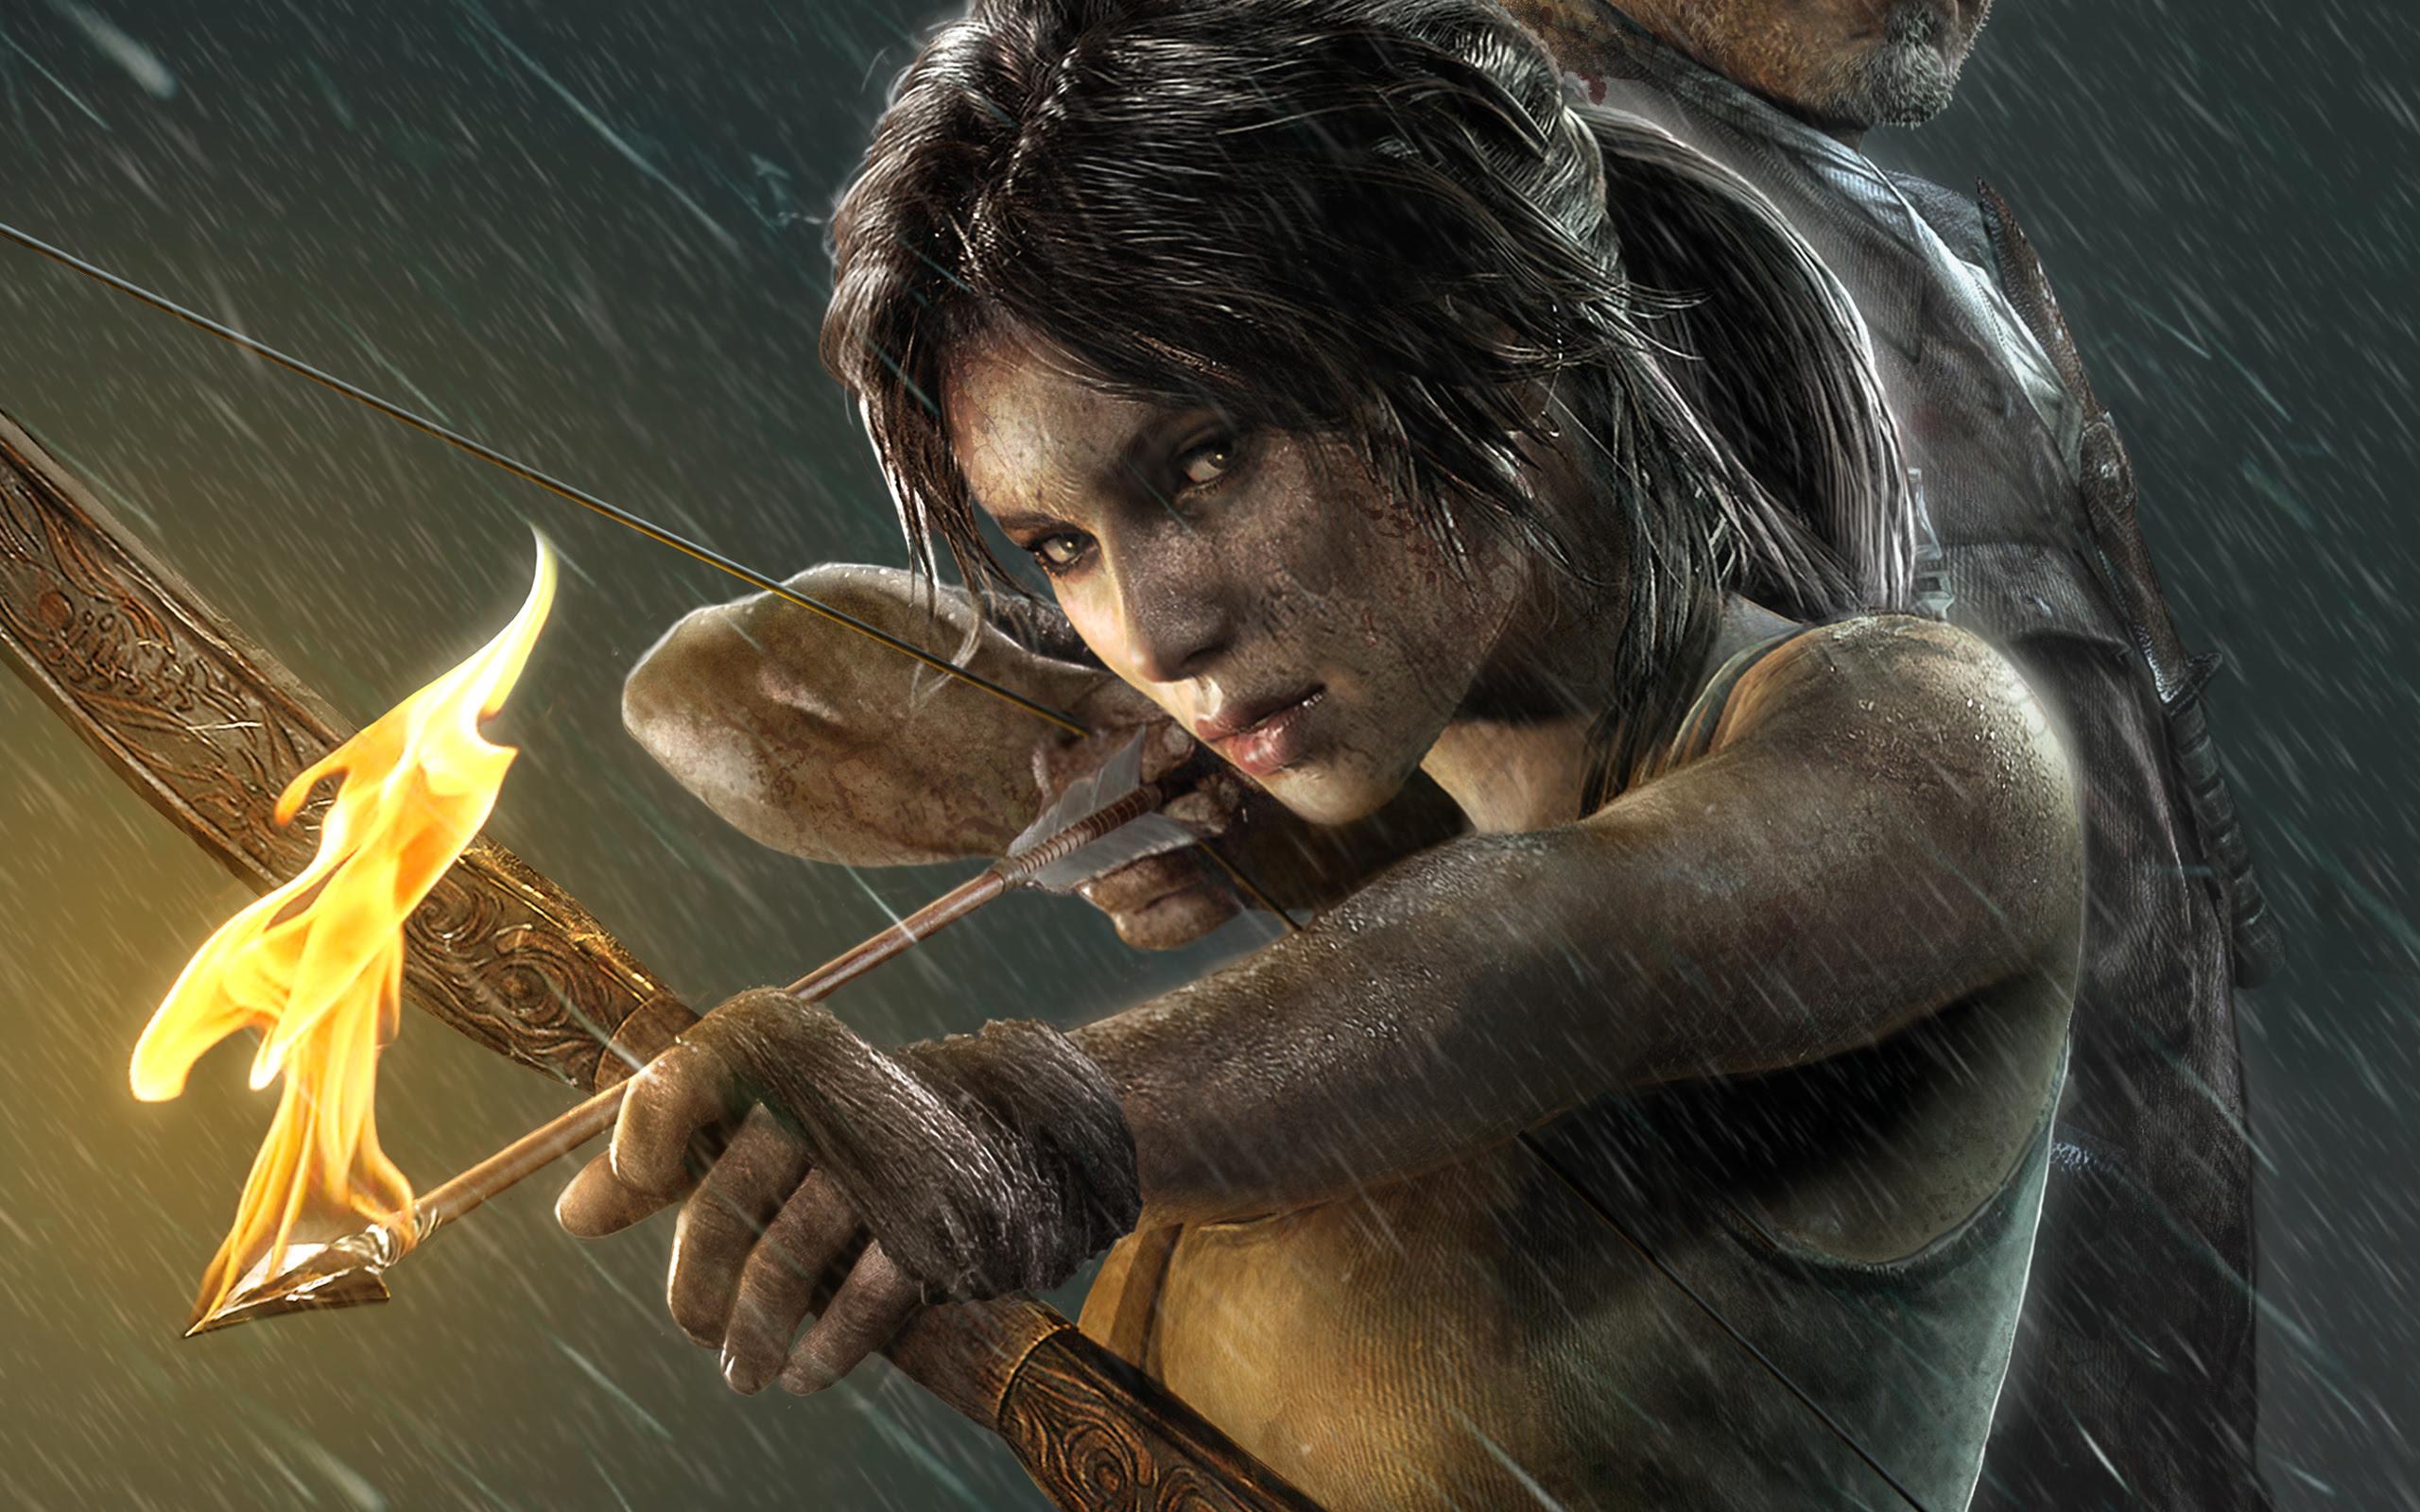 2013 Lara Croft Tomb Raider Wallpapers Wallpapers Hd